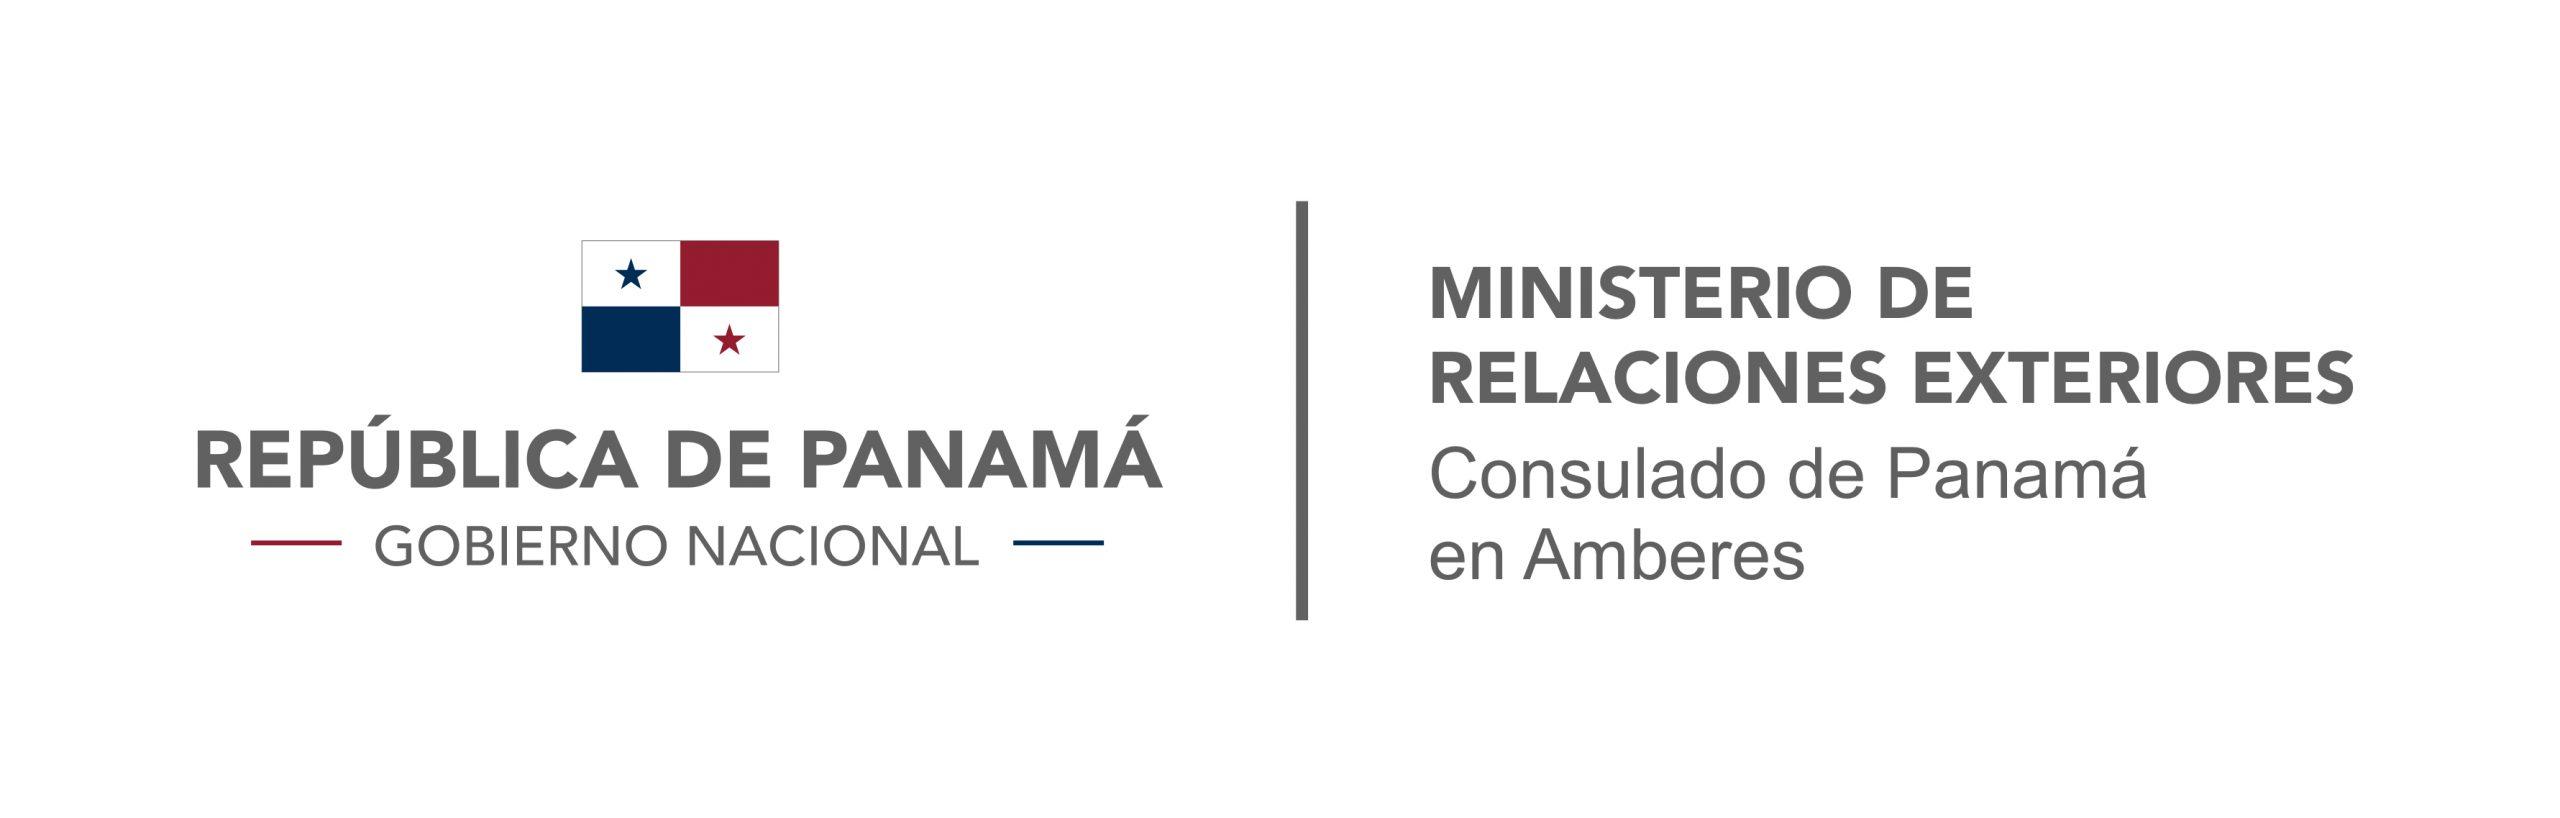 Consulate of Panama